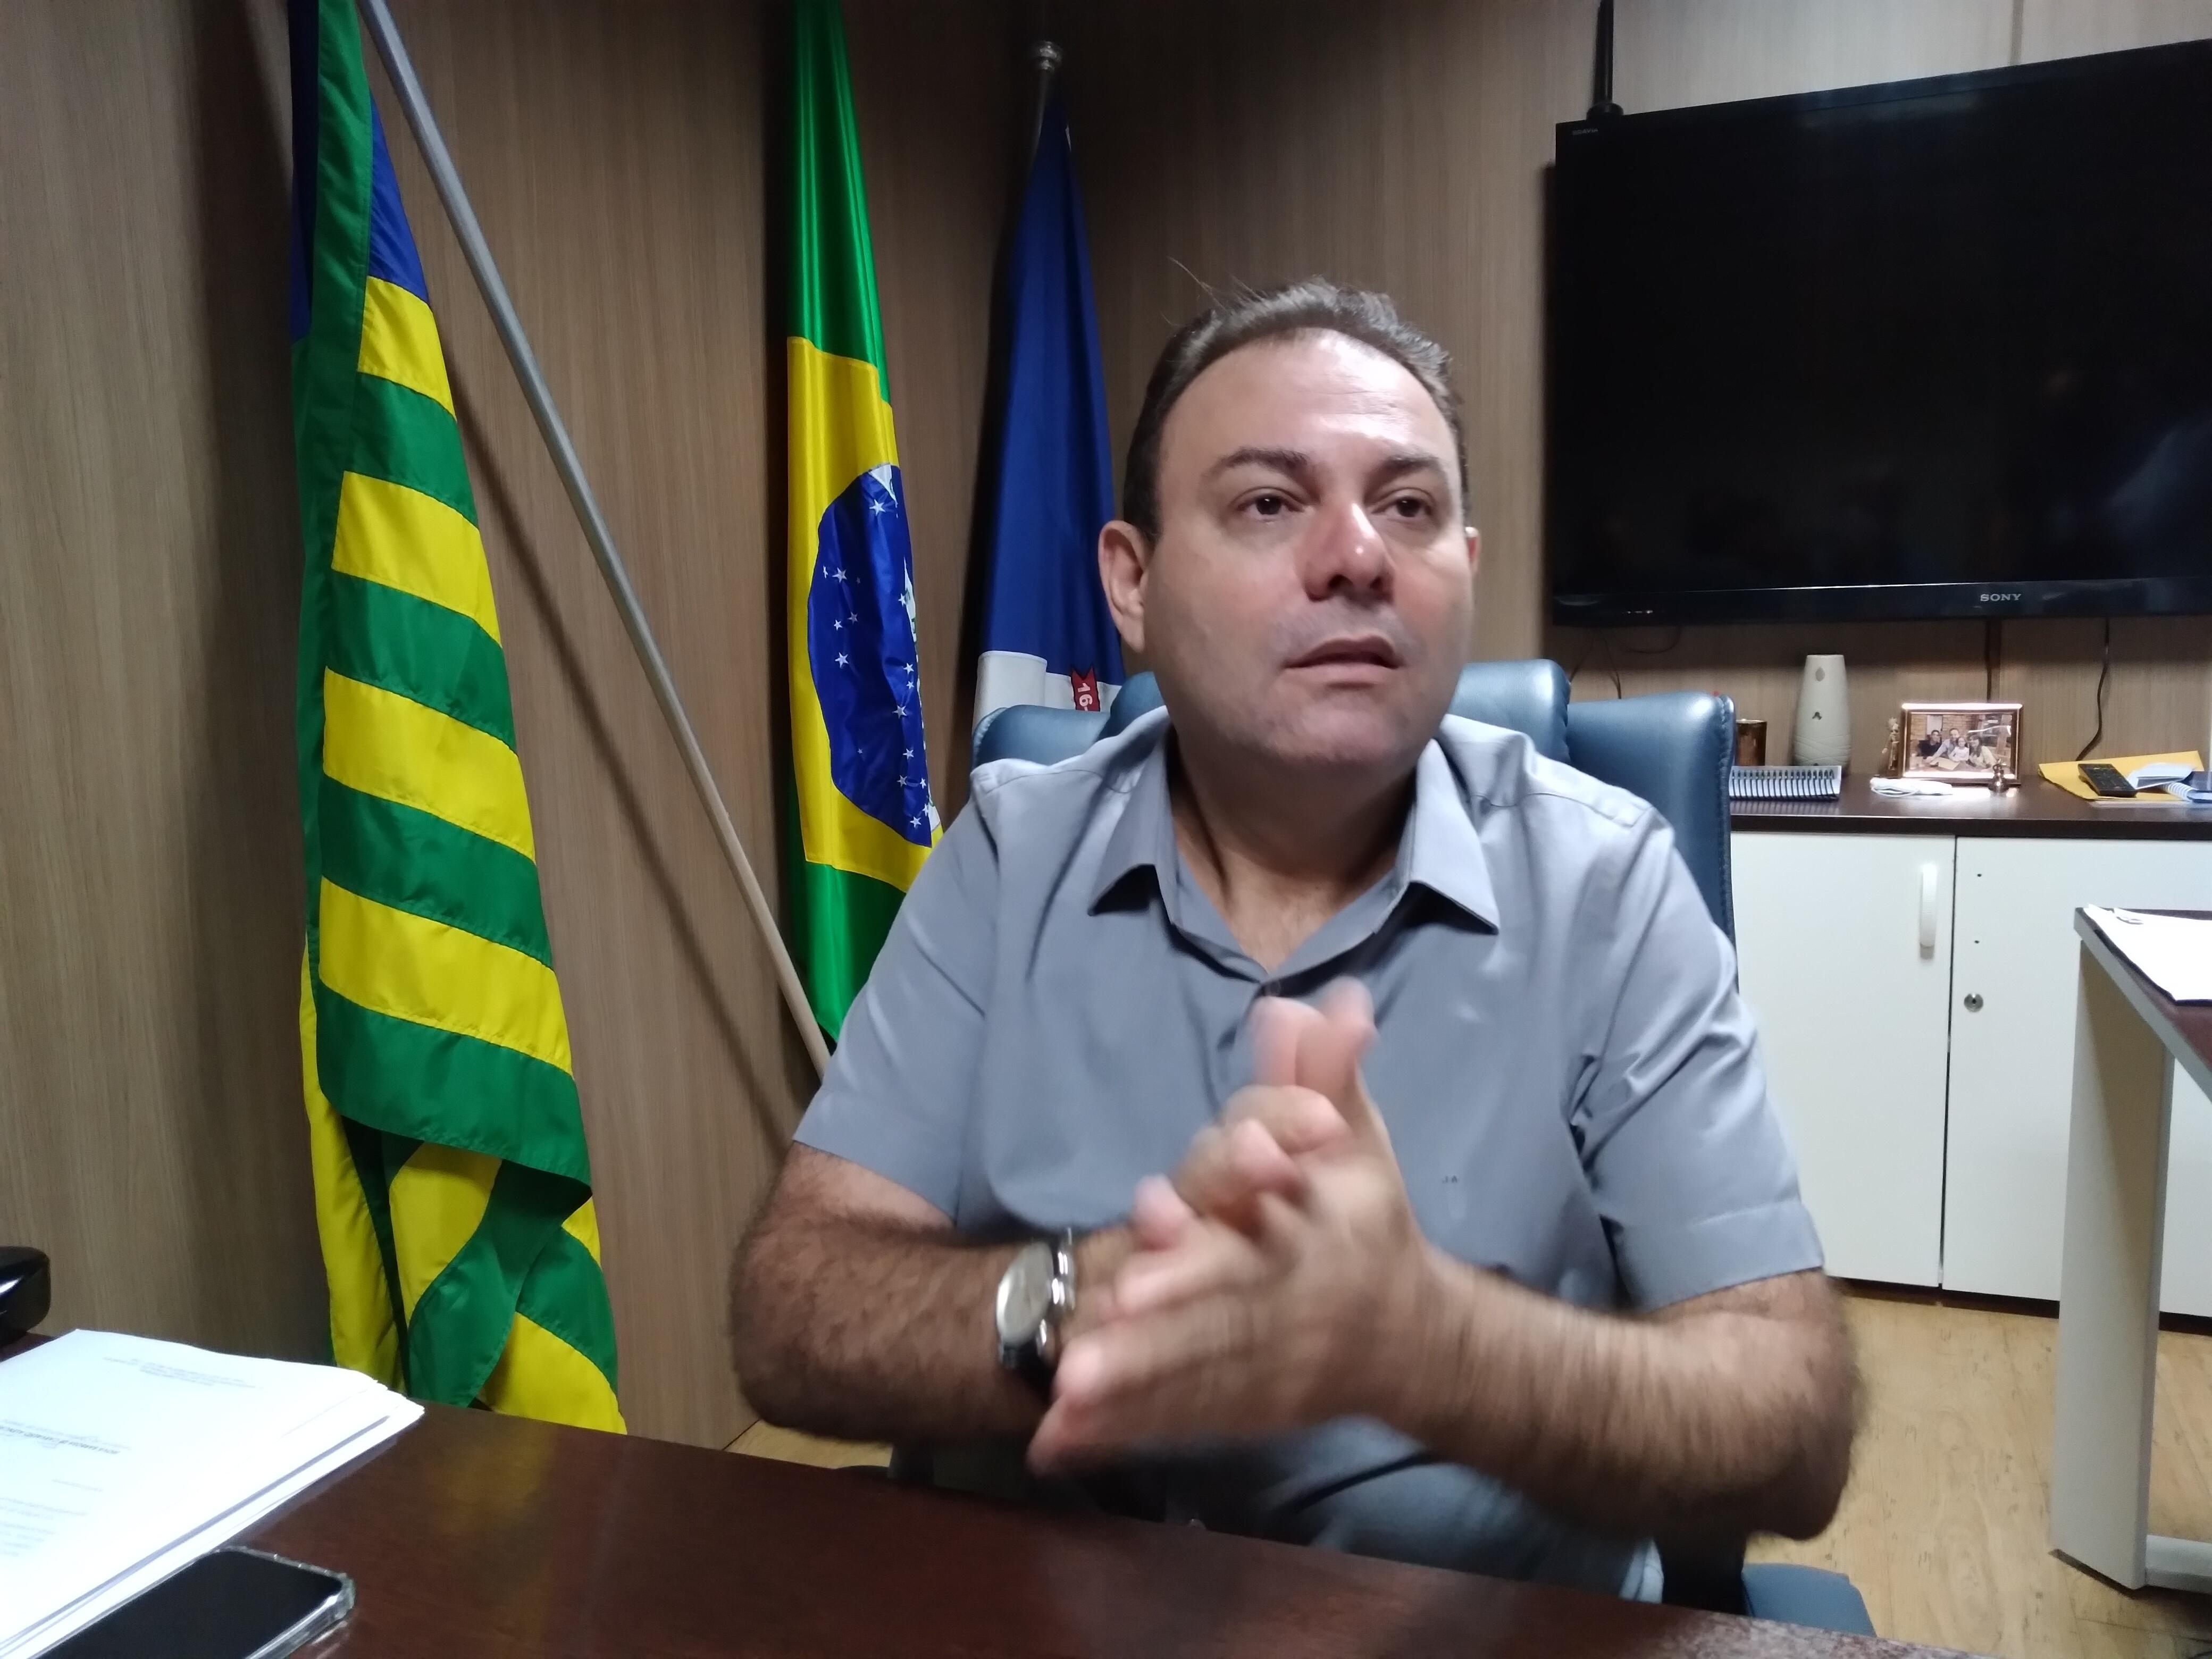 Vereador Jeová Alencar, presidente da Câmara Municipal de Teresina